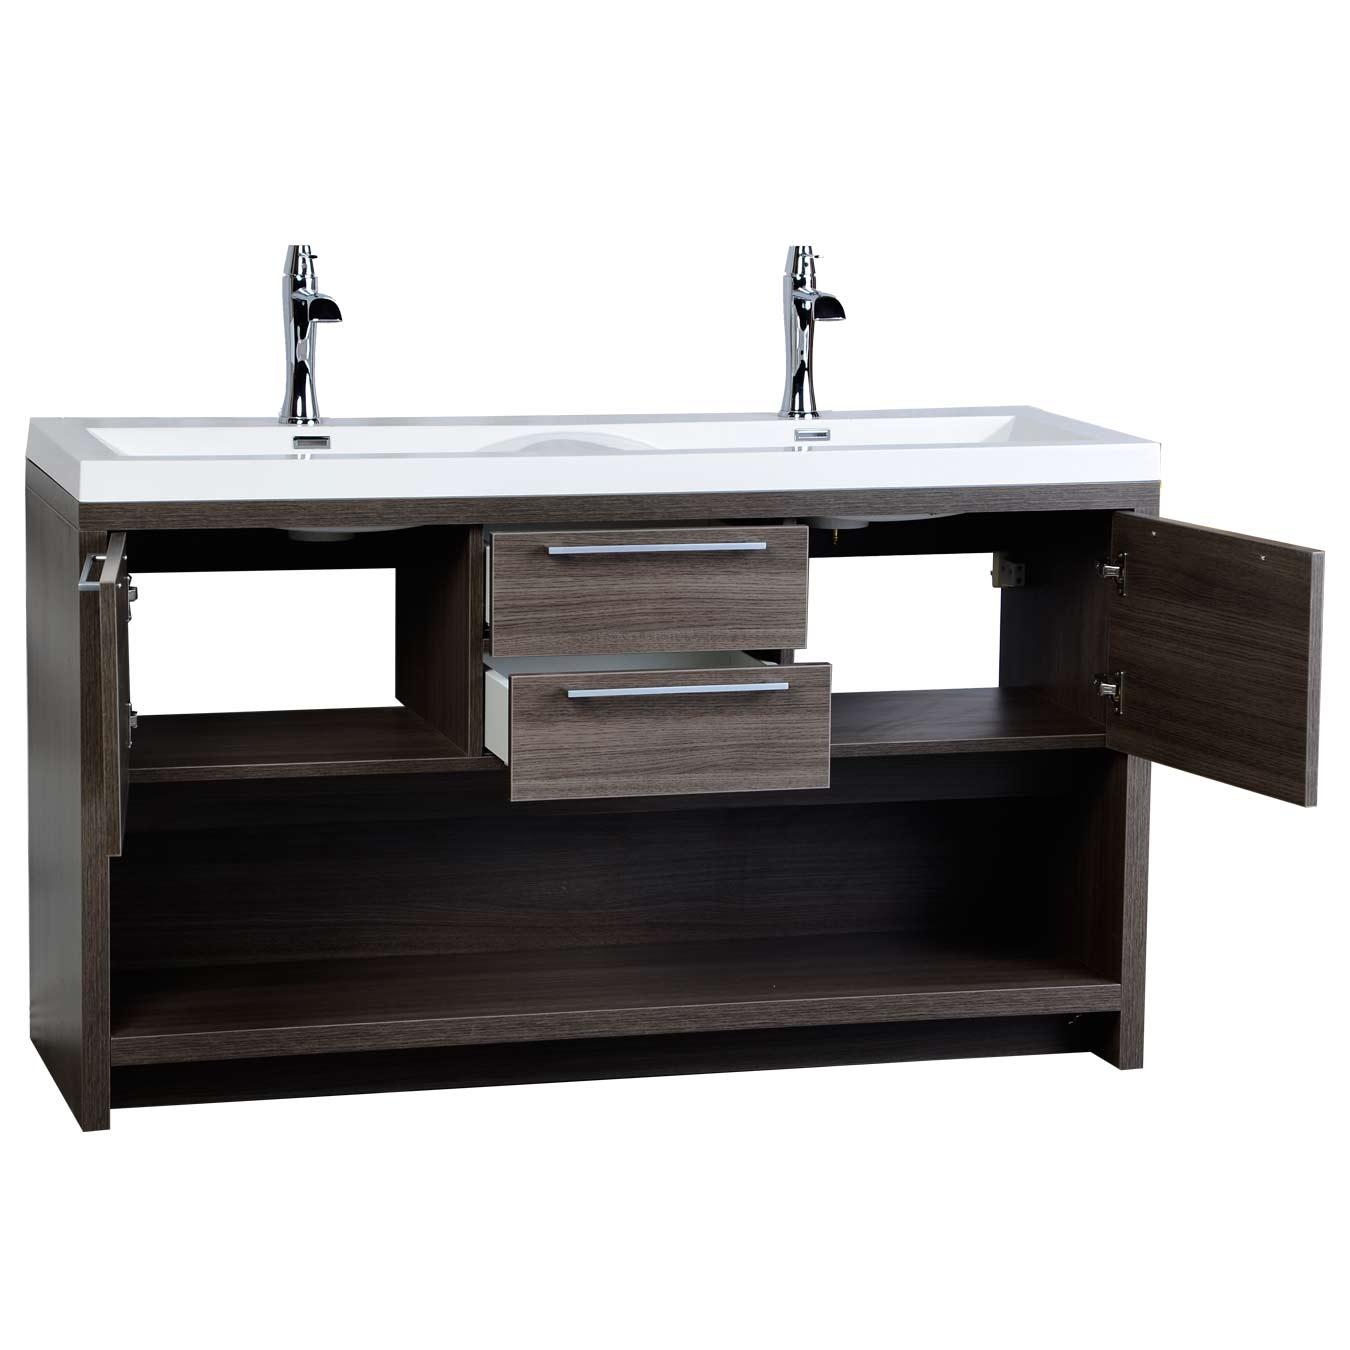 57 Contemporary Double Vanity Set With Wavy Sink Grey Oak Tn F1440 Go